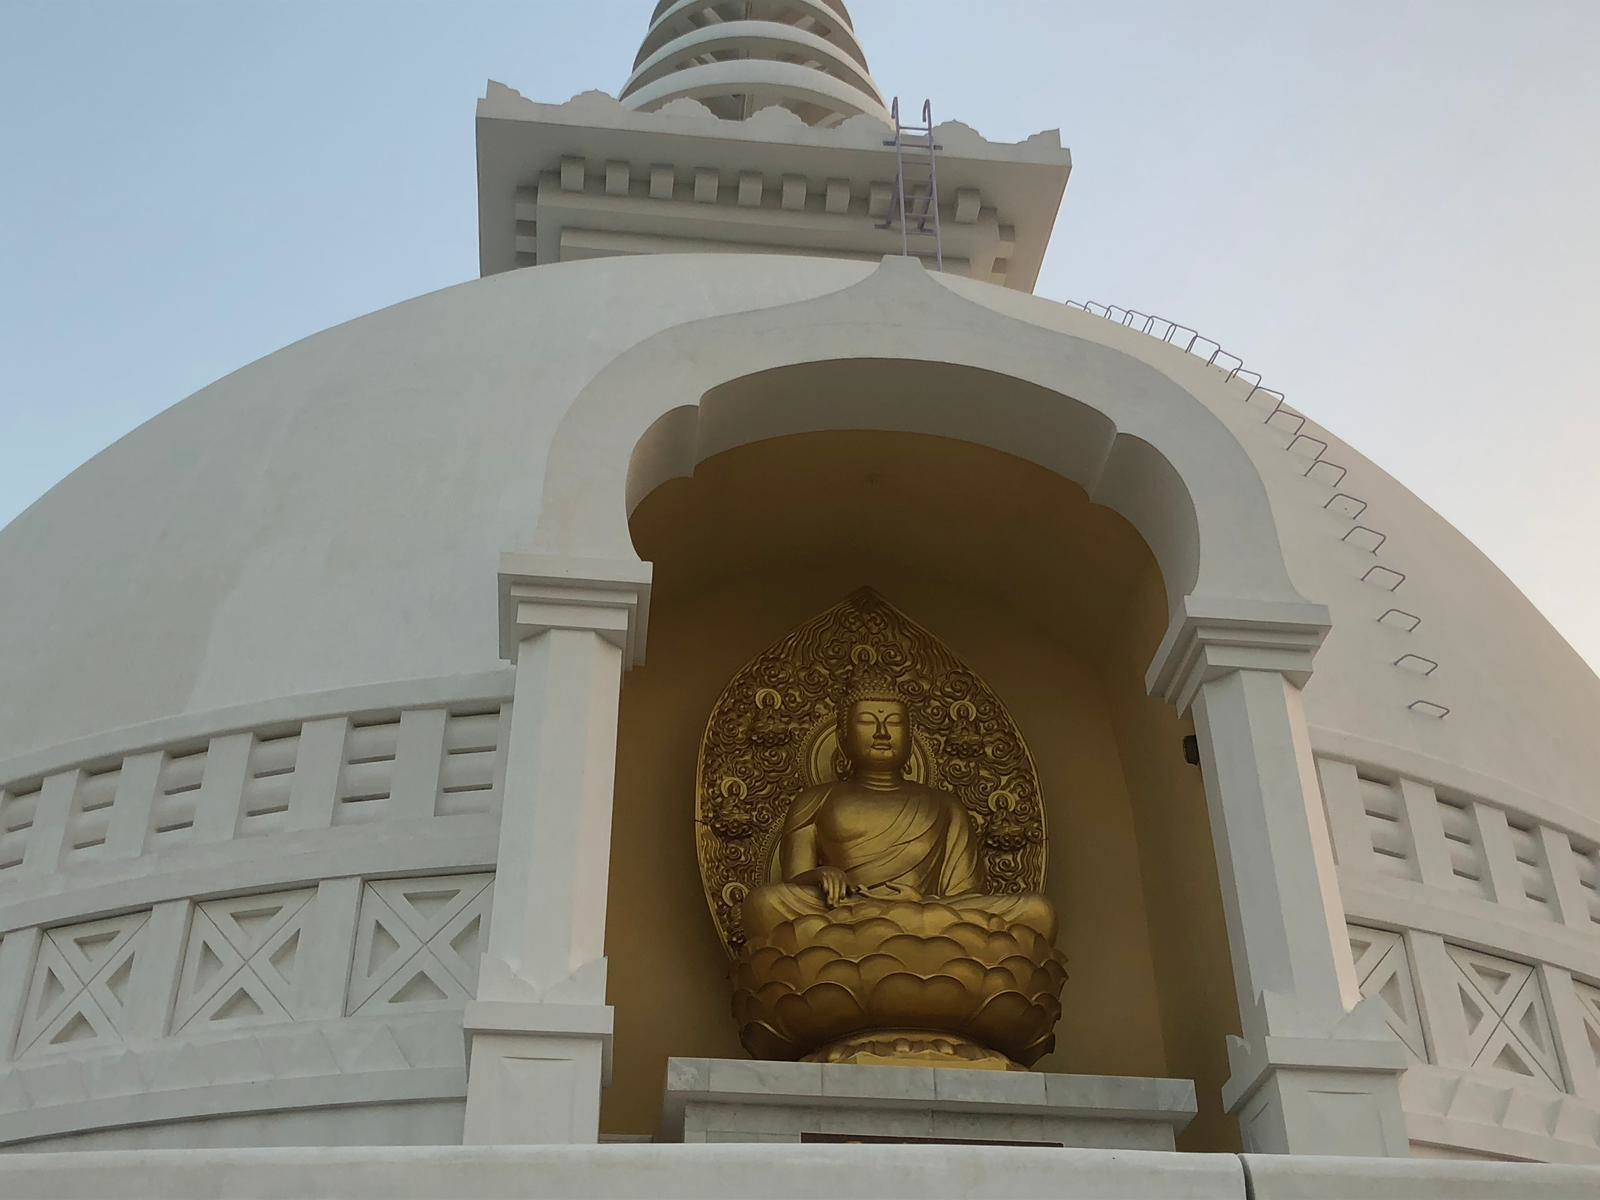 viaggio-in-nepal-580036bbeecaa09cd263b2f